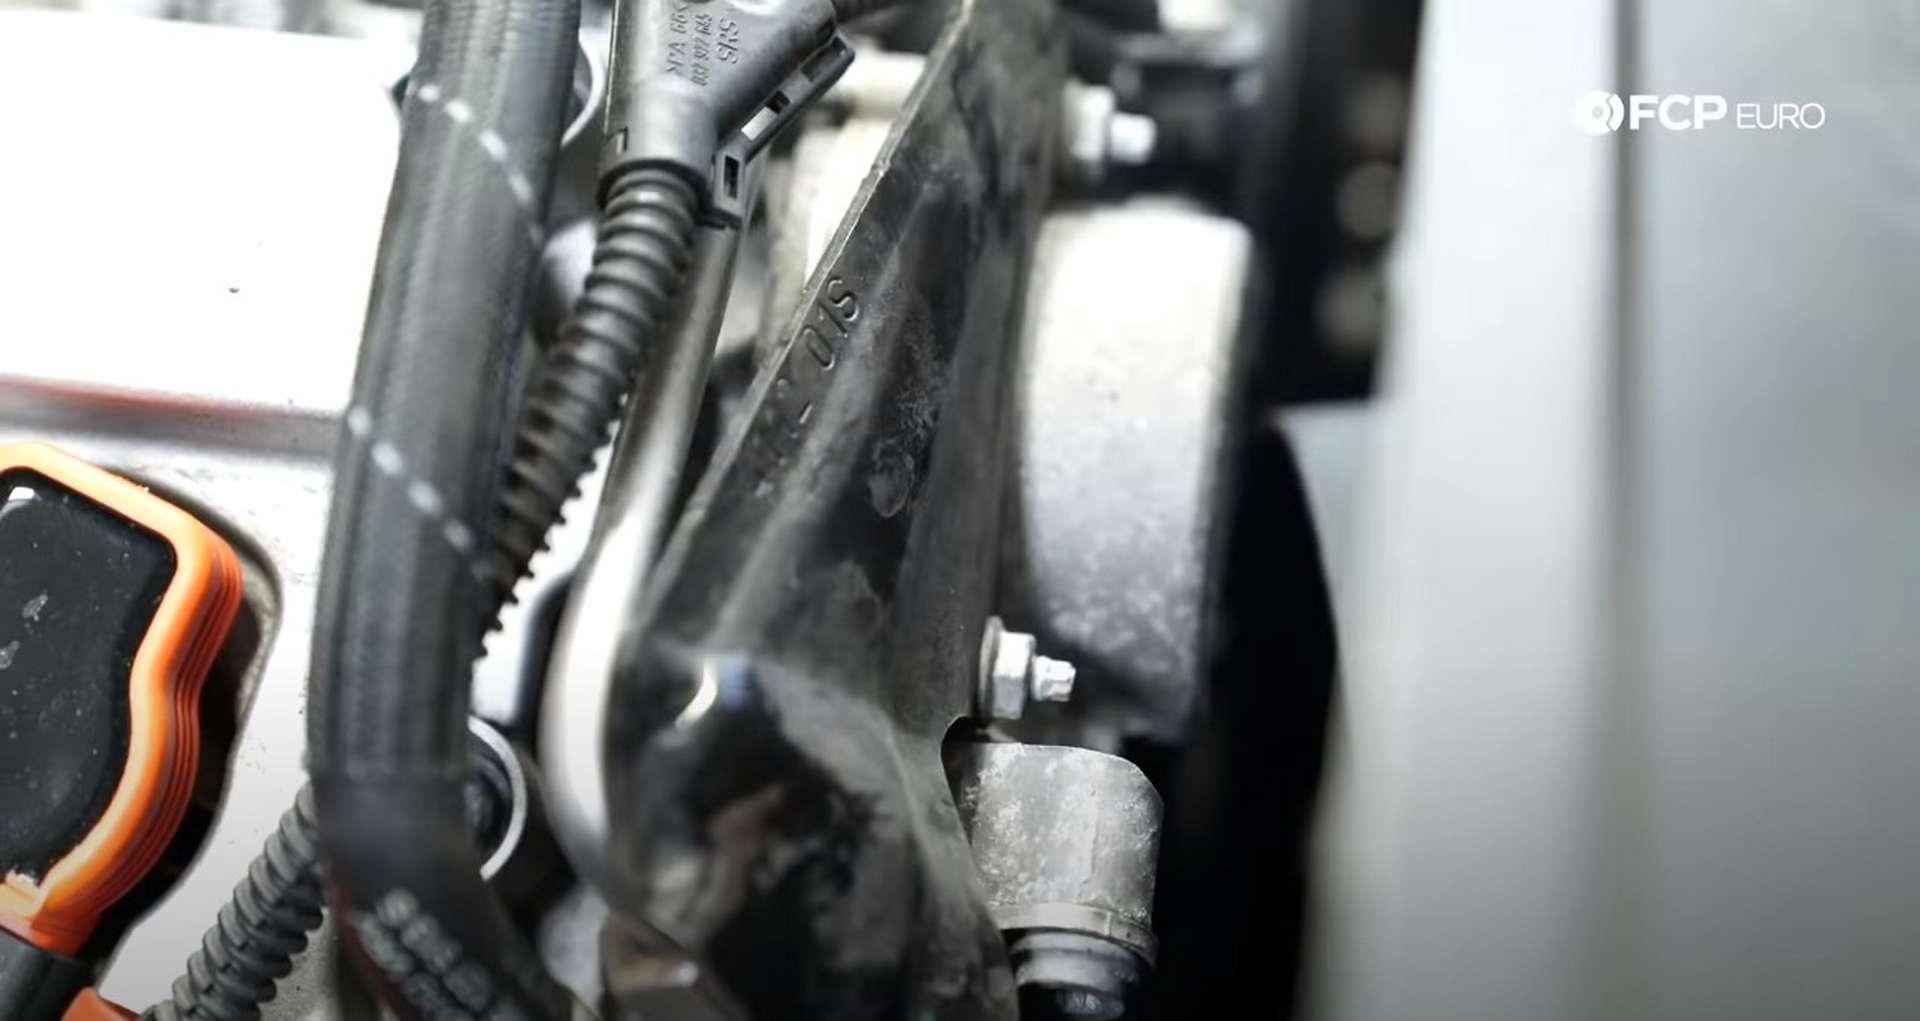 DIY Audi 3.0t Walnut Blasting Intake Valves high-pressure fuel pump cover location